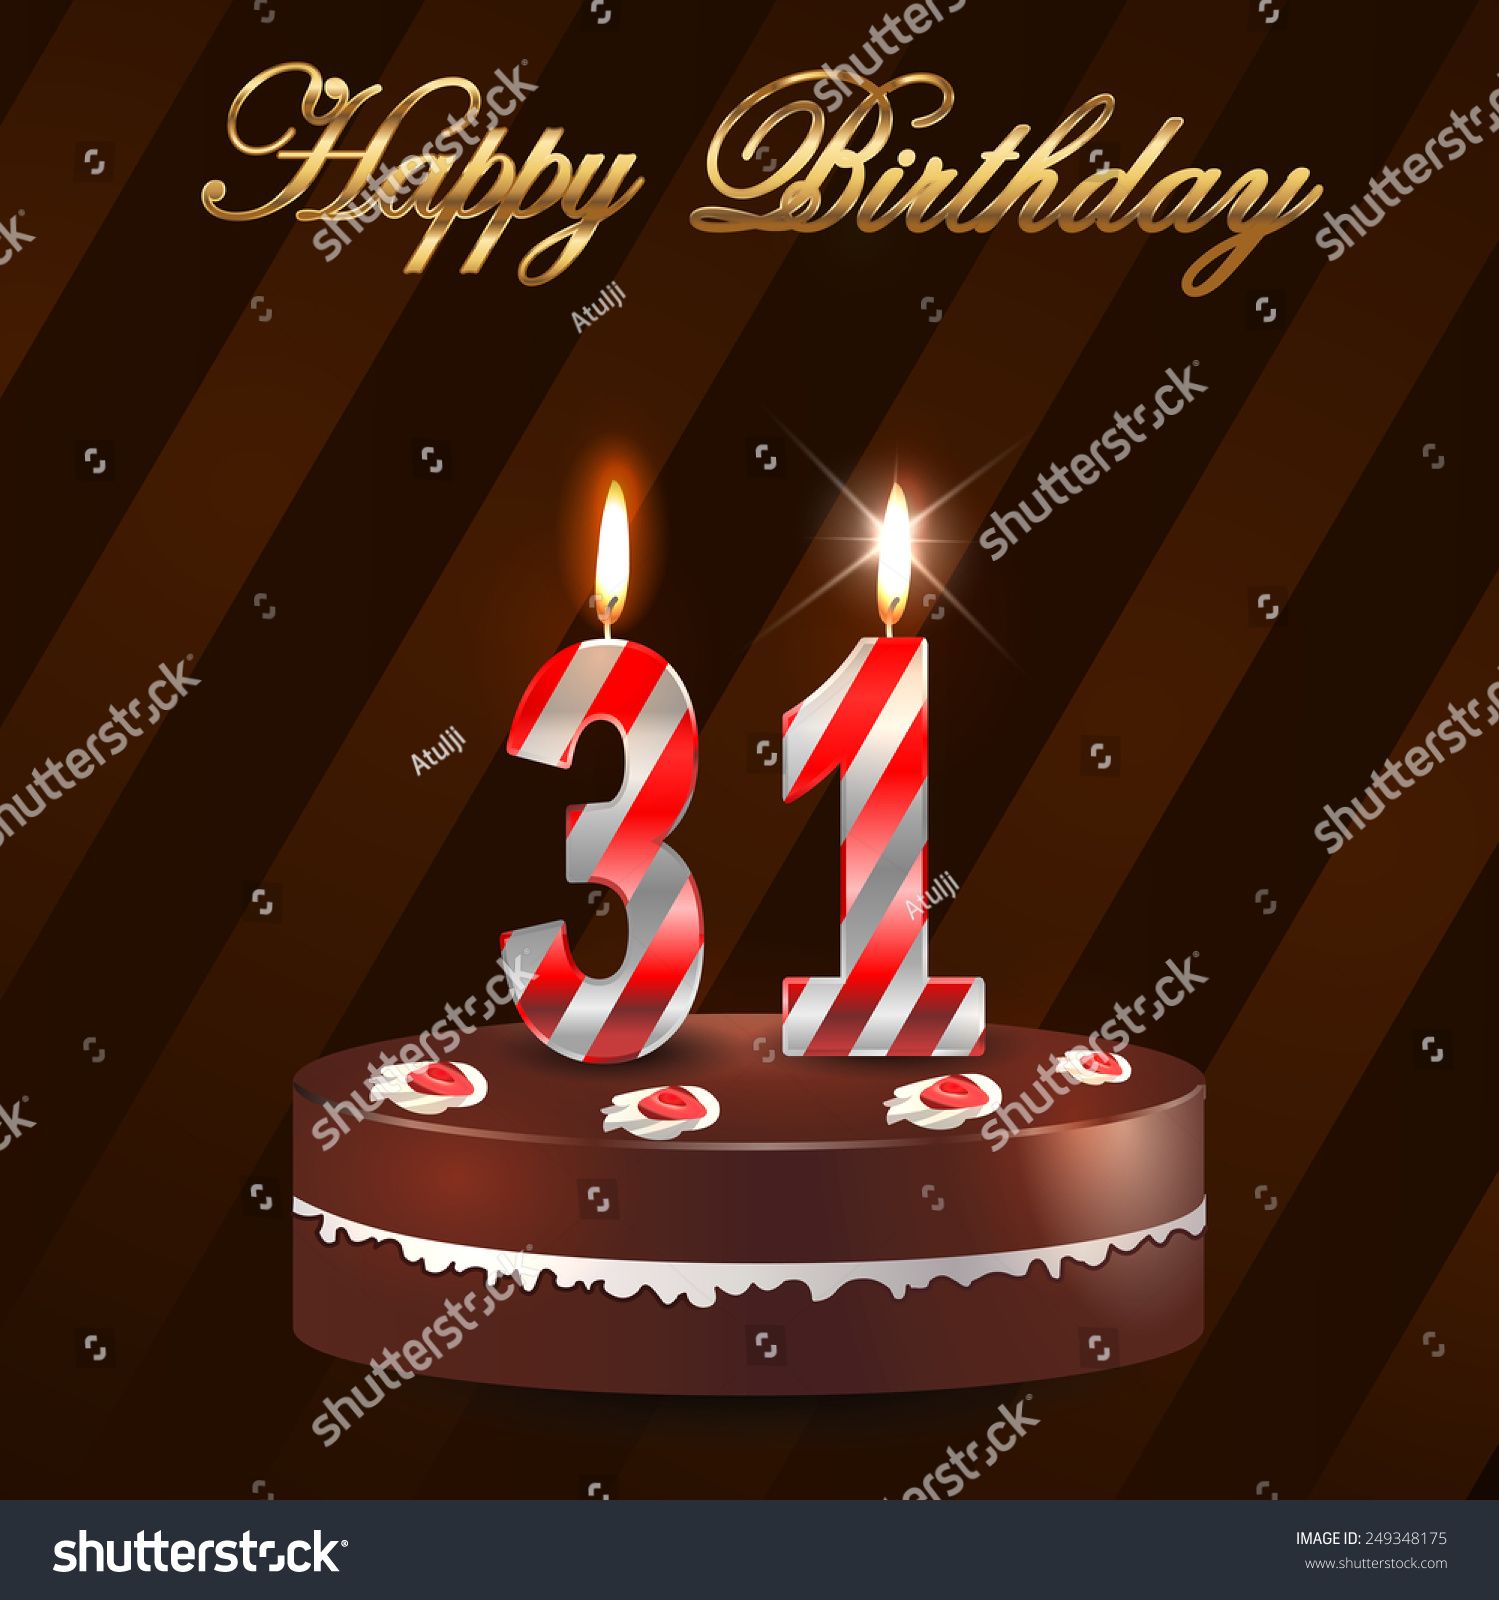 31 Year Happy Birthday Card Cake Stock Vector 249348175 Happy 31st Birthday Wishes